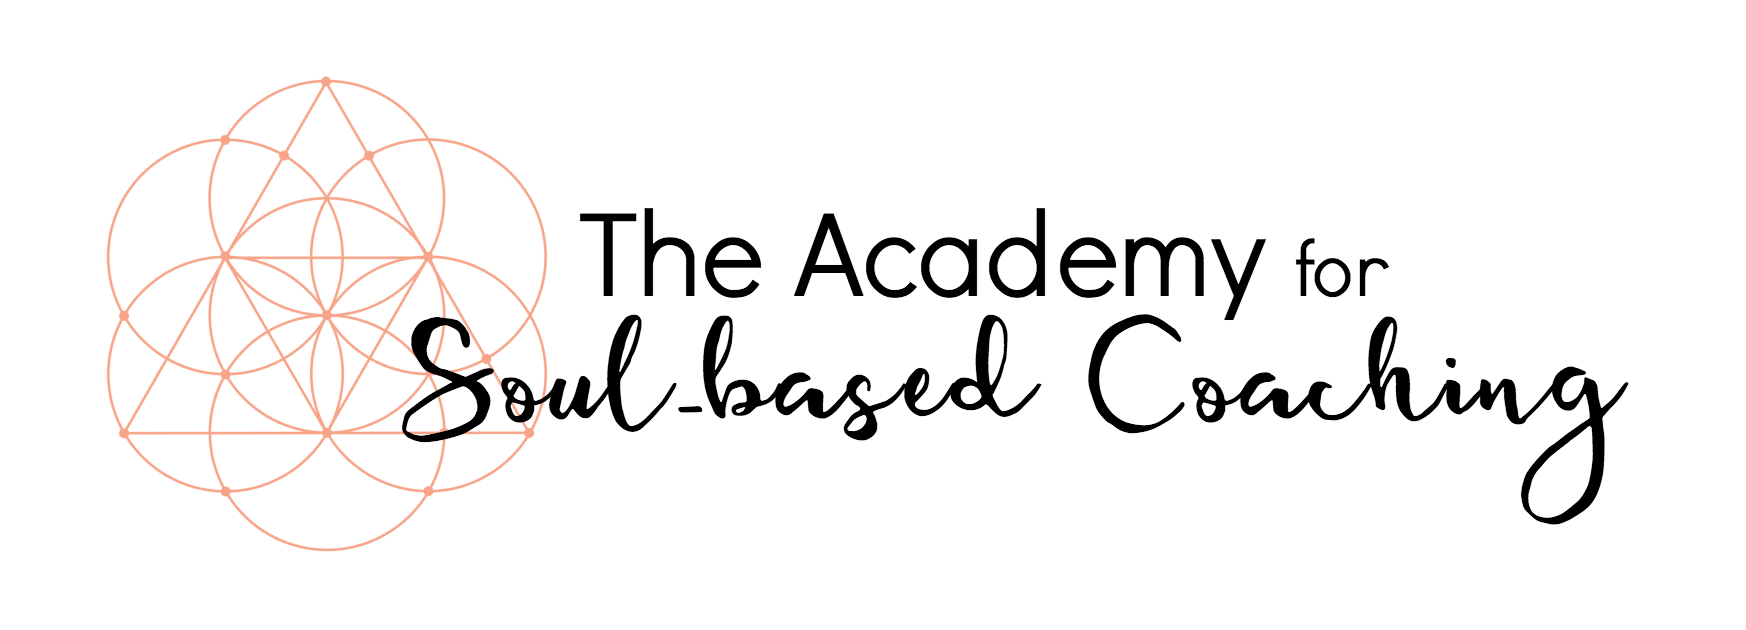 logo-def-png.png